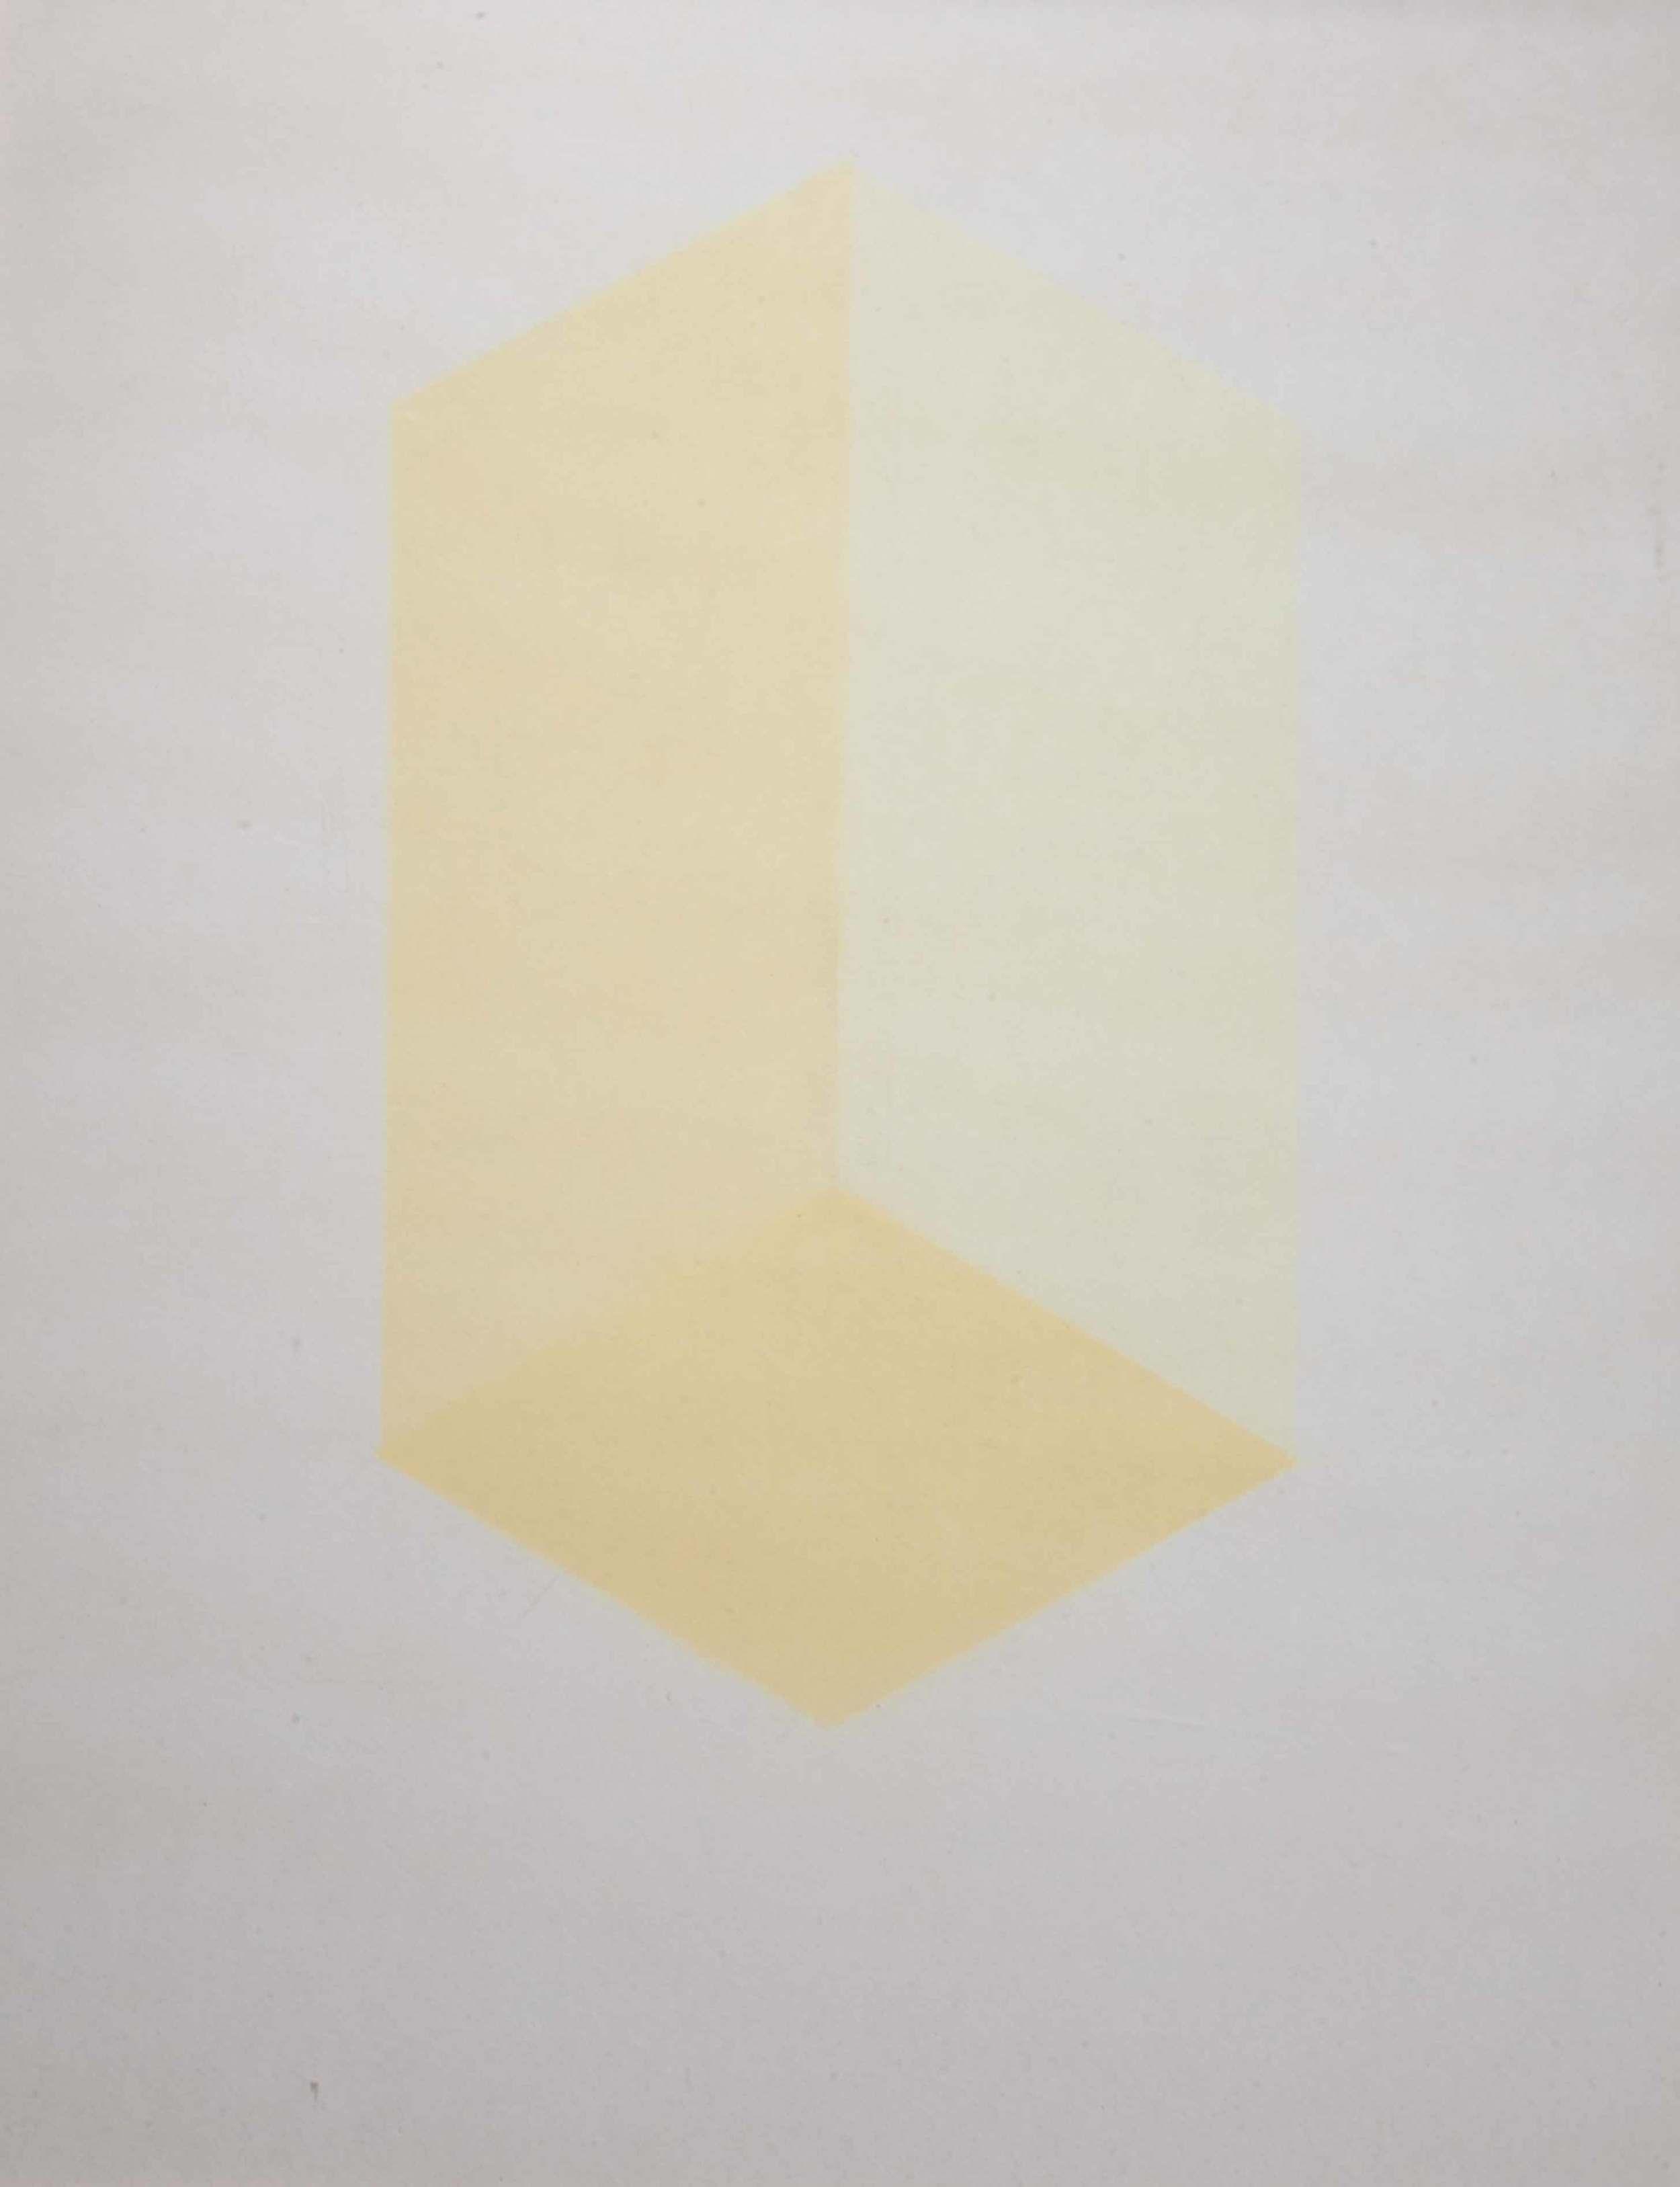 solar-stains-6.jpg